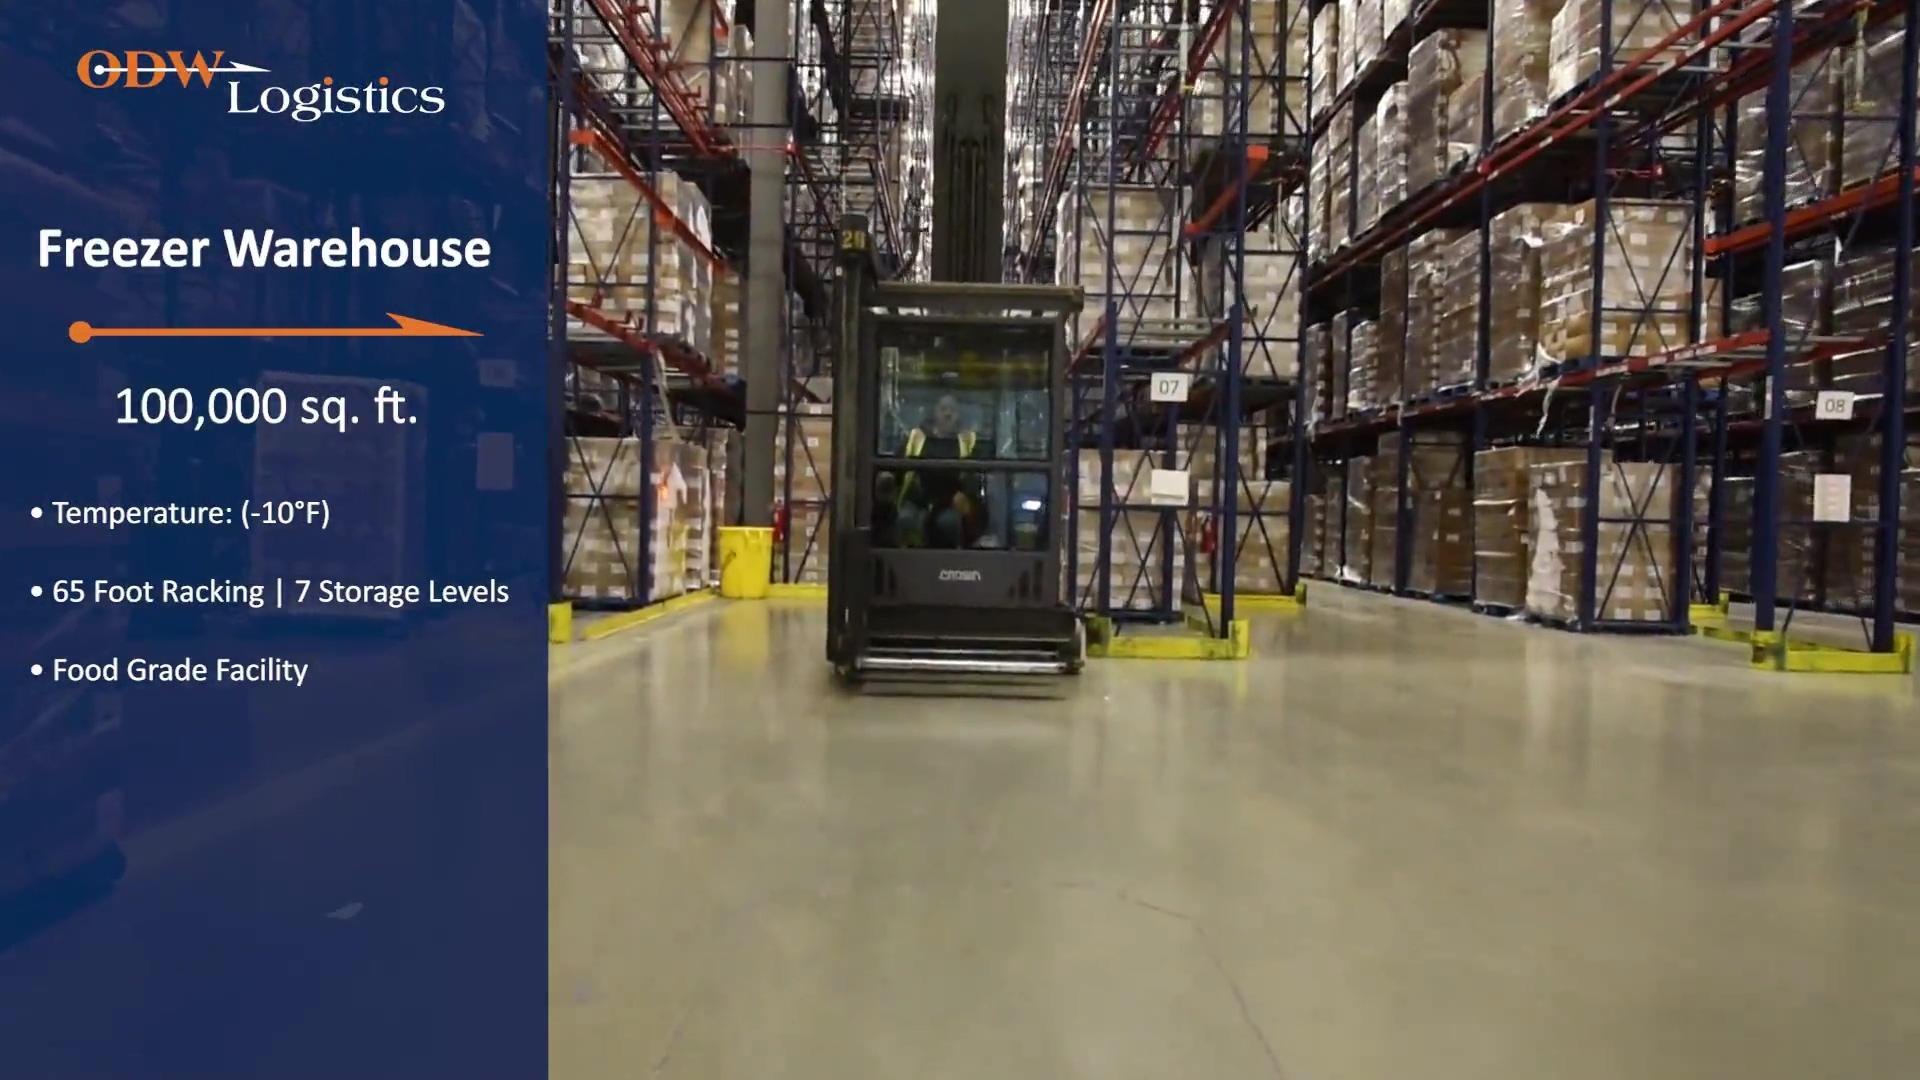 ODW Logistics Cold Chain Facility